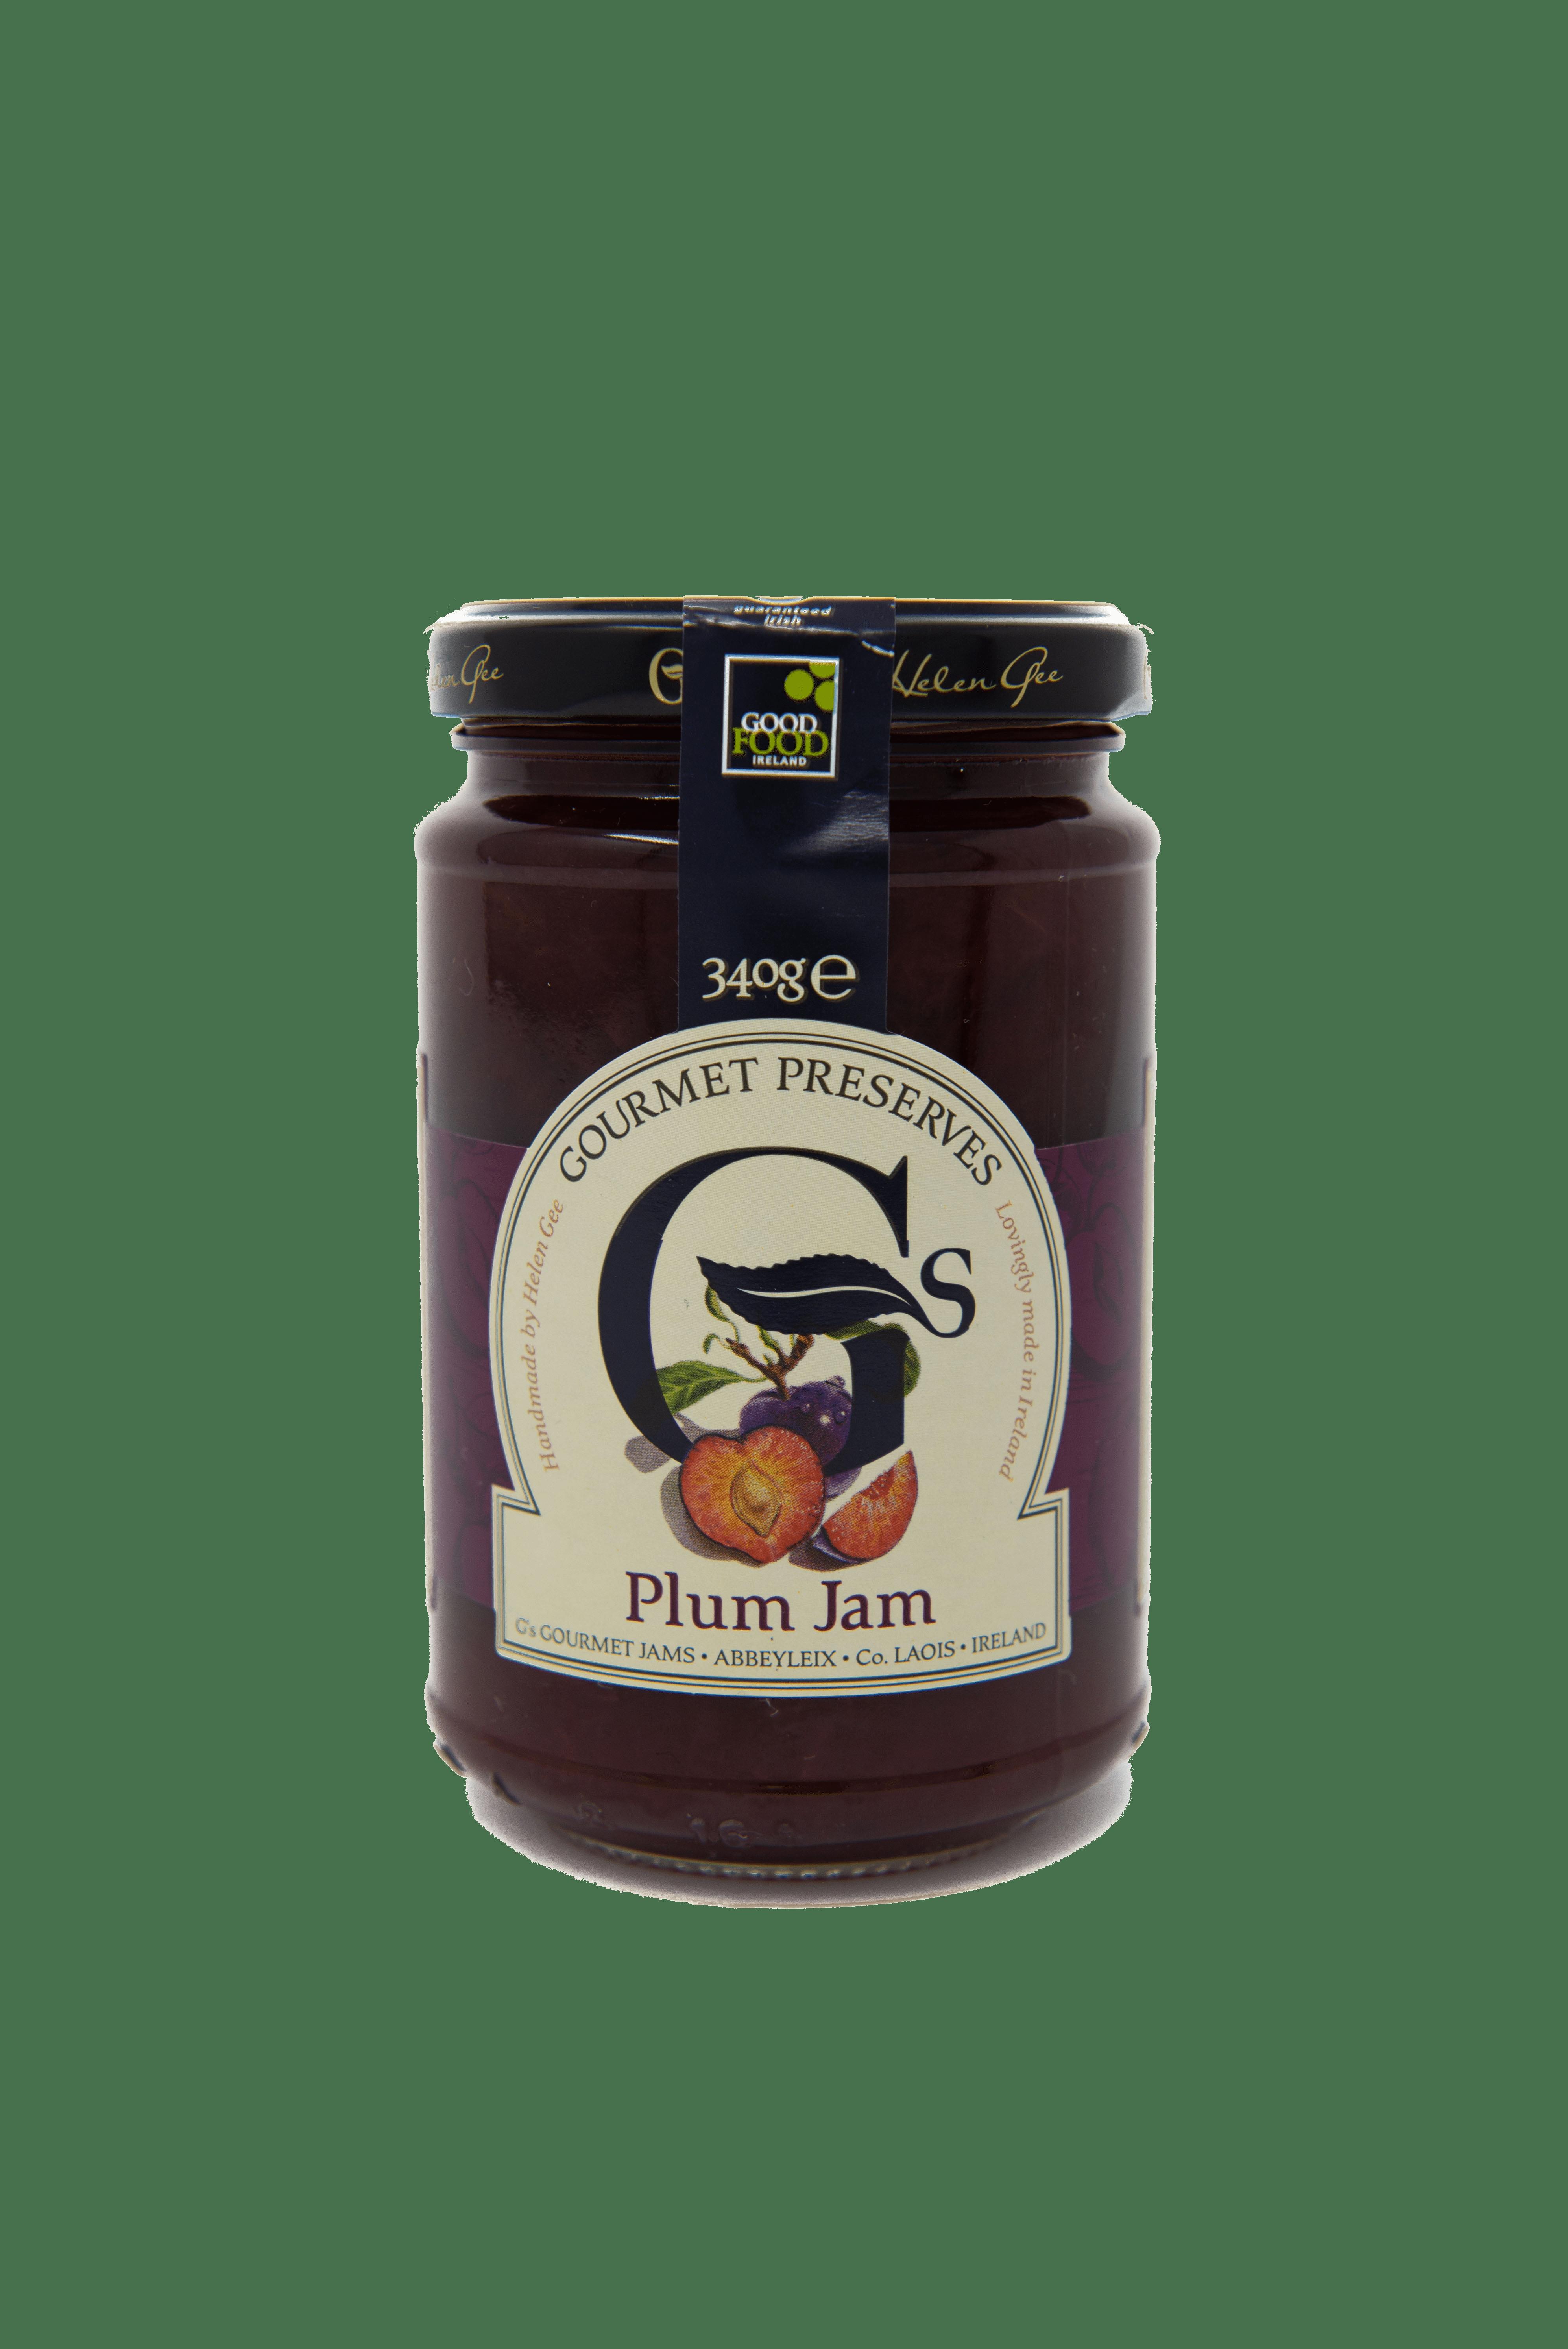 Plum Jam Image